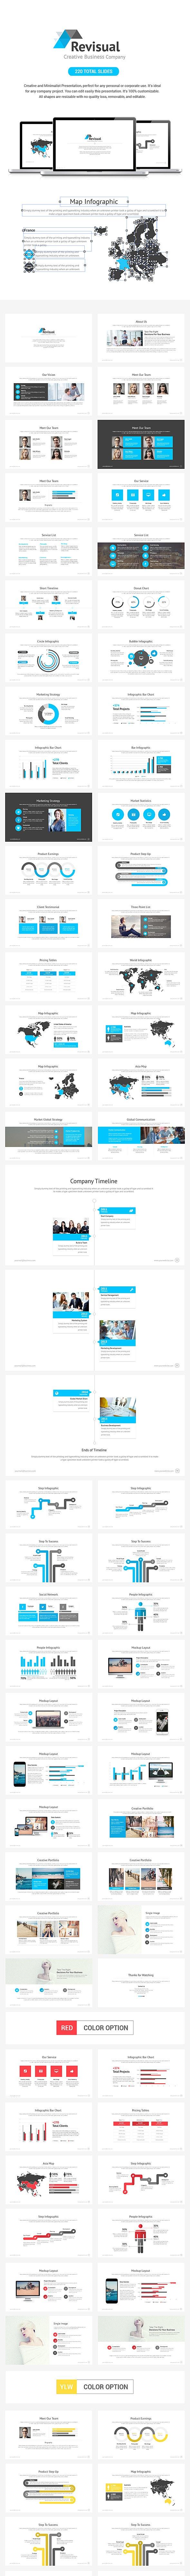 Revisual Keynote Template - Business Keynote Templates